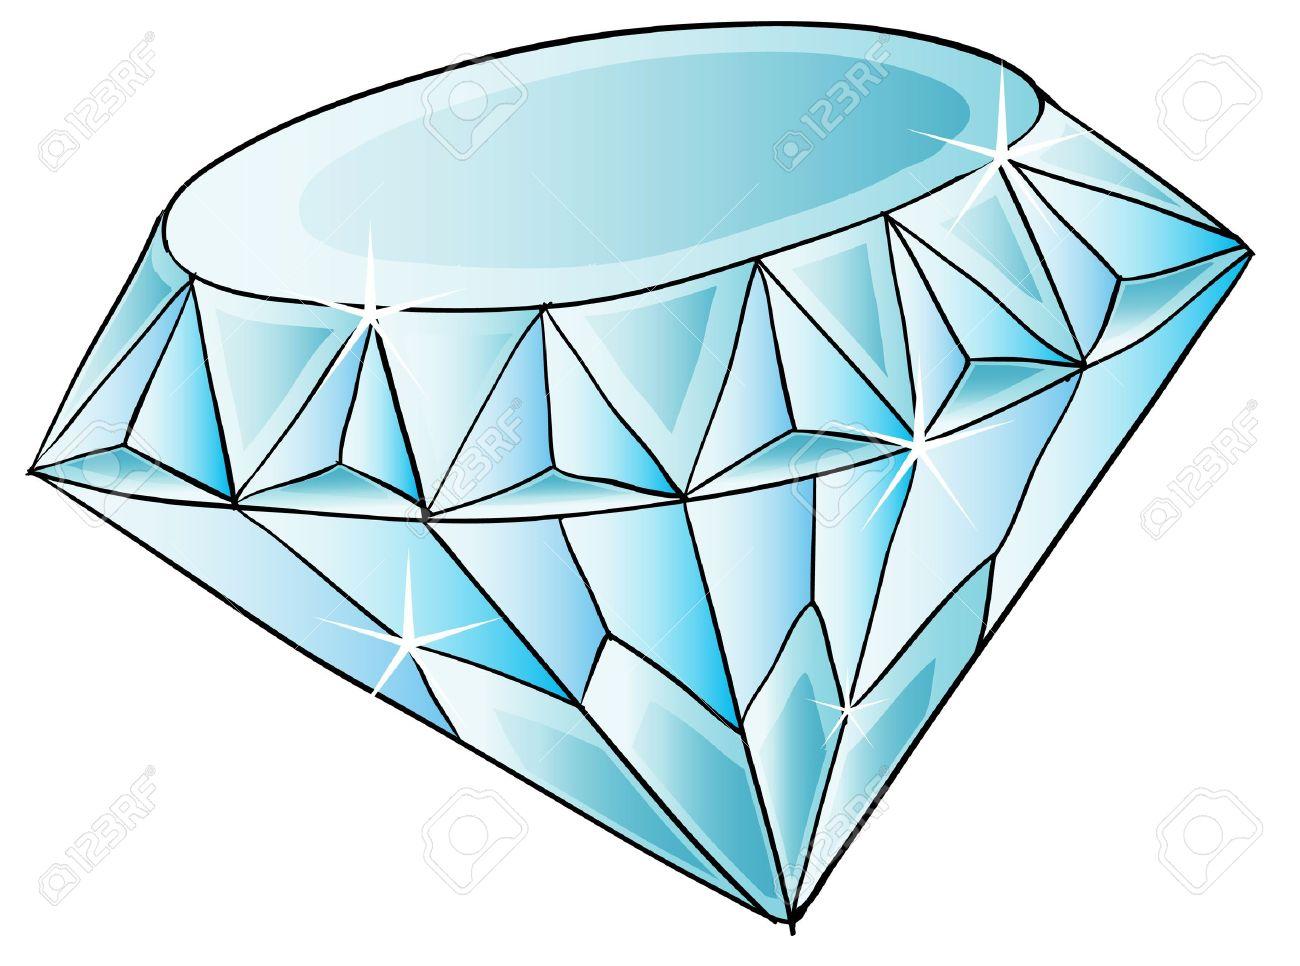 Clipart Diamond & Diamond Clip Art Images.